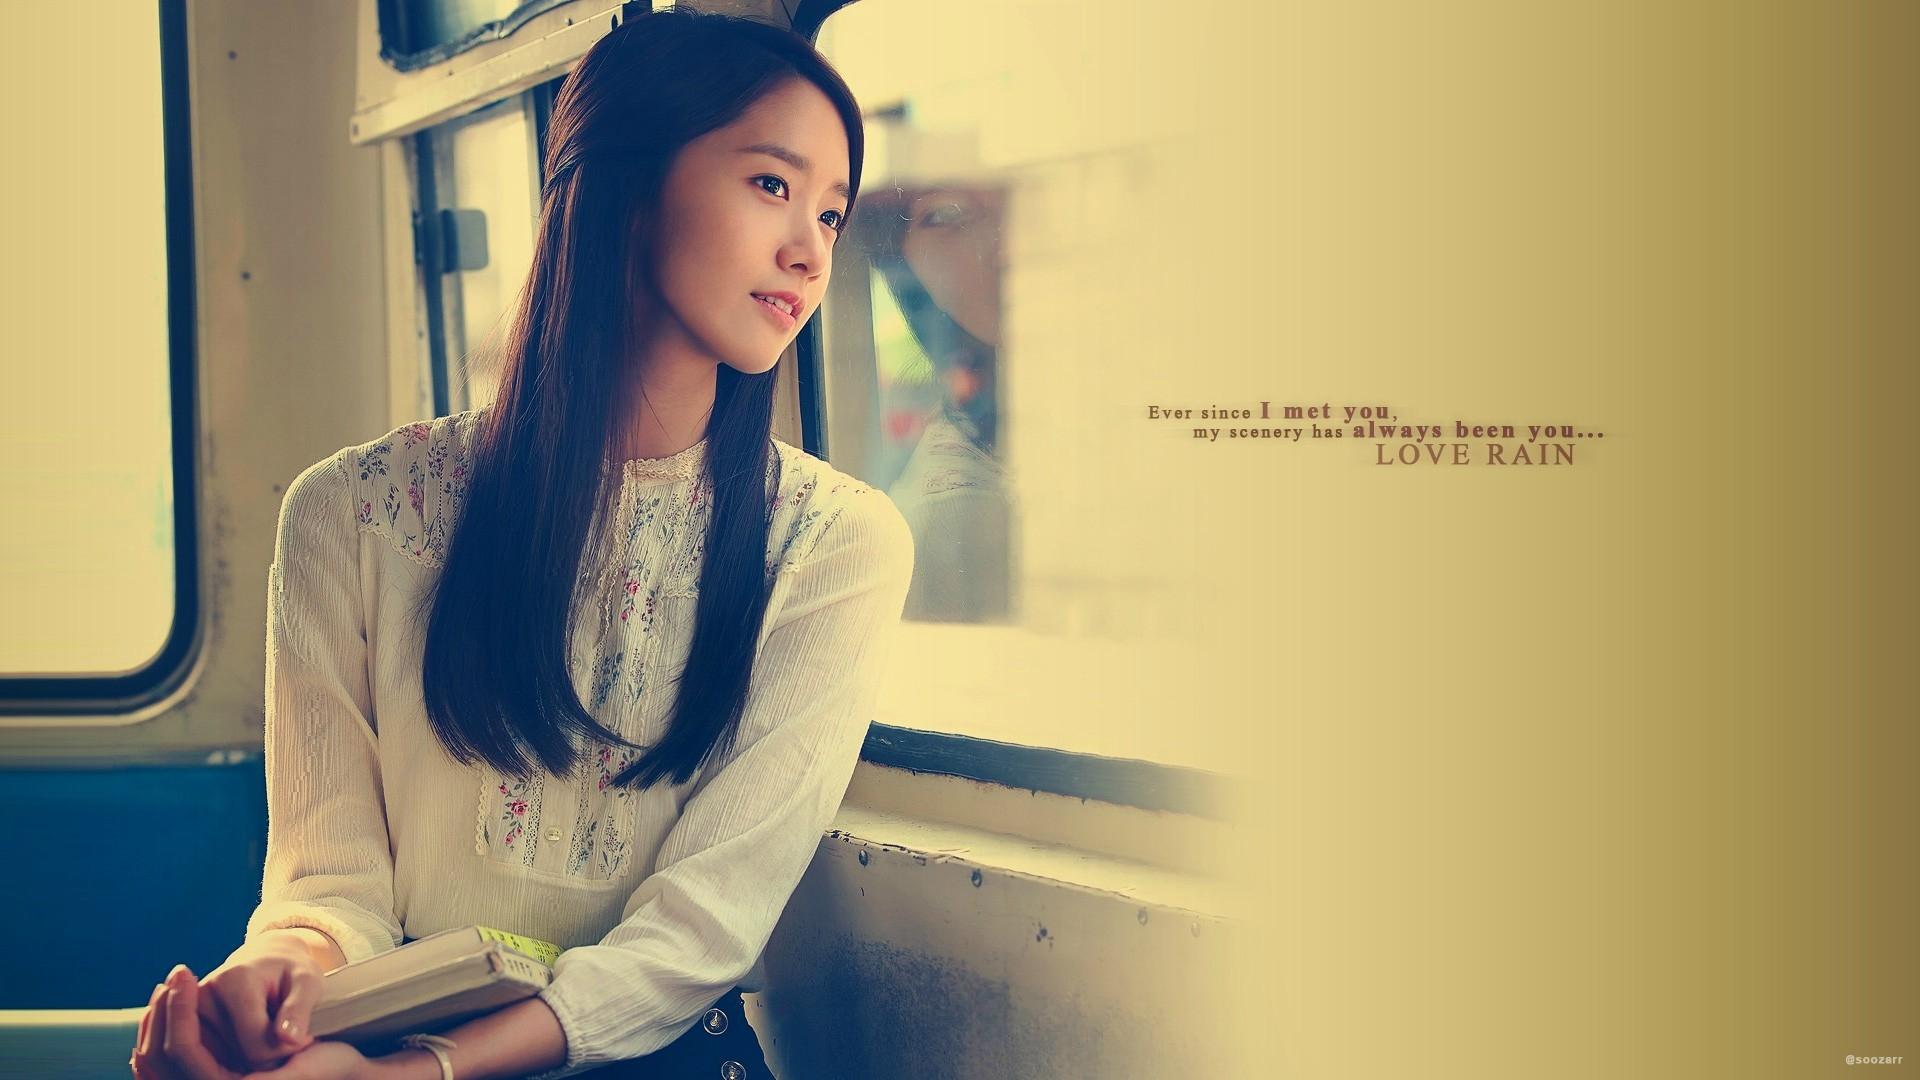 Love Rain Wallpaper Yoona   Wallpaper HD Collection 1920x1080